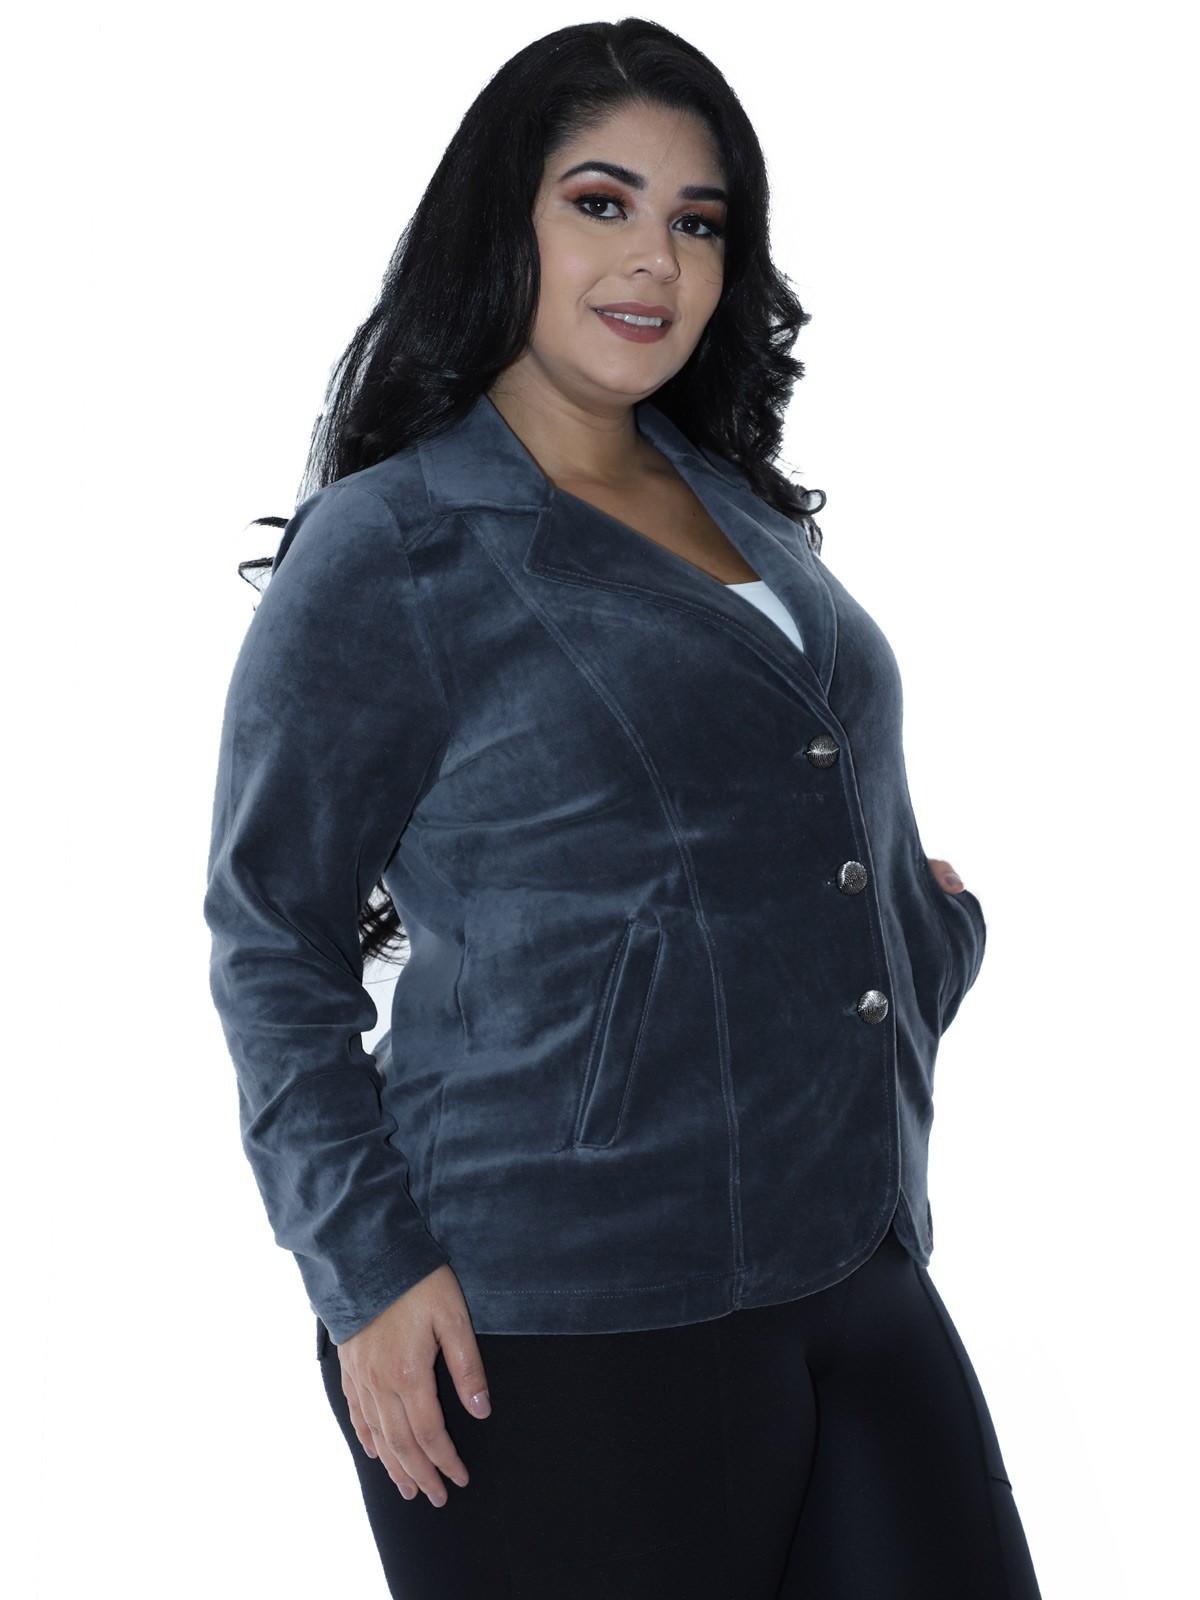 Casaco Plus Size Feminino de Plush Cinza